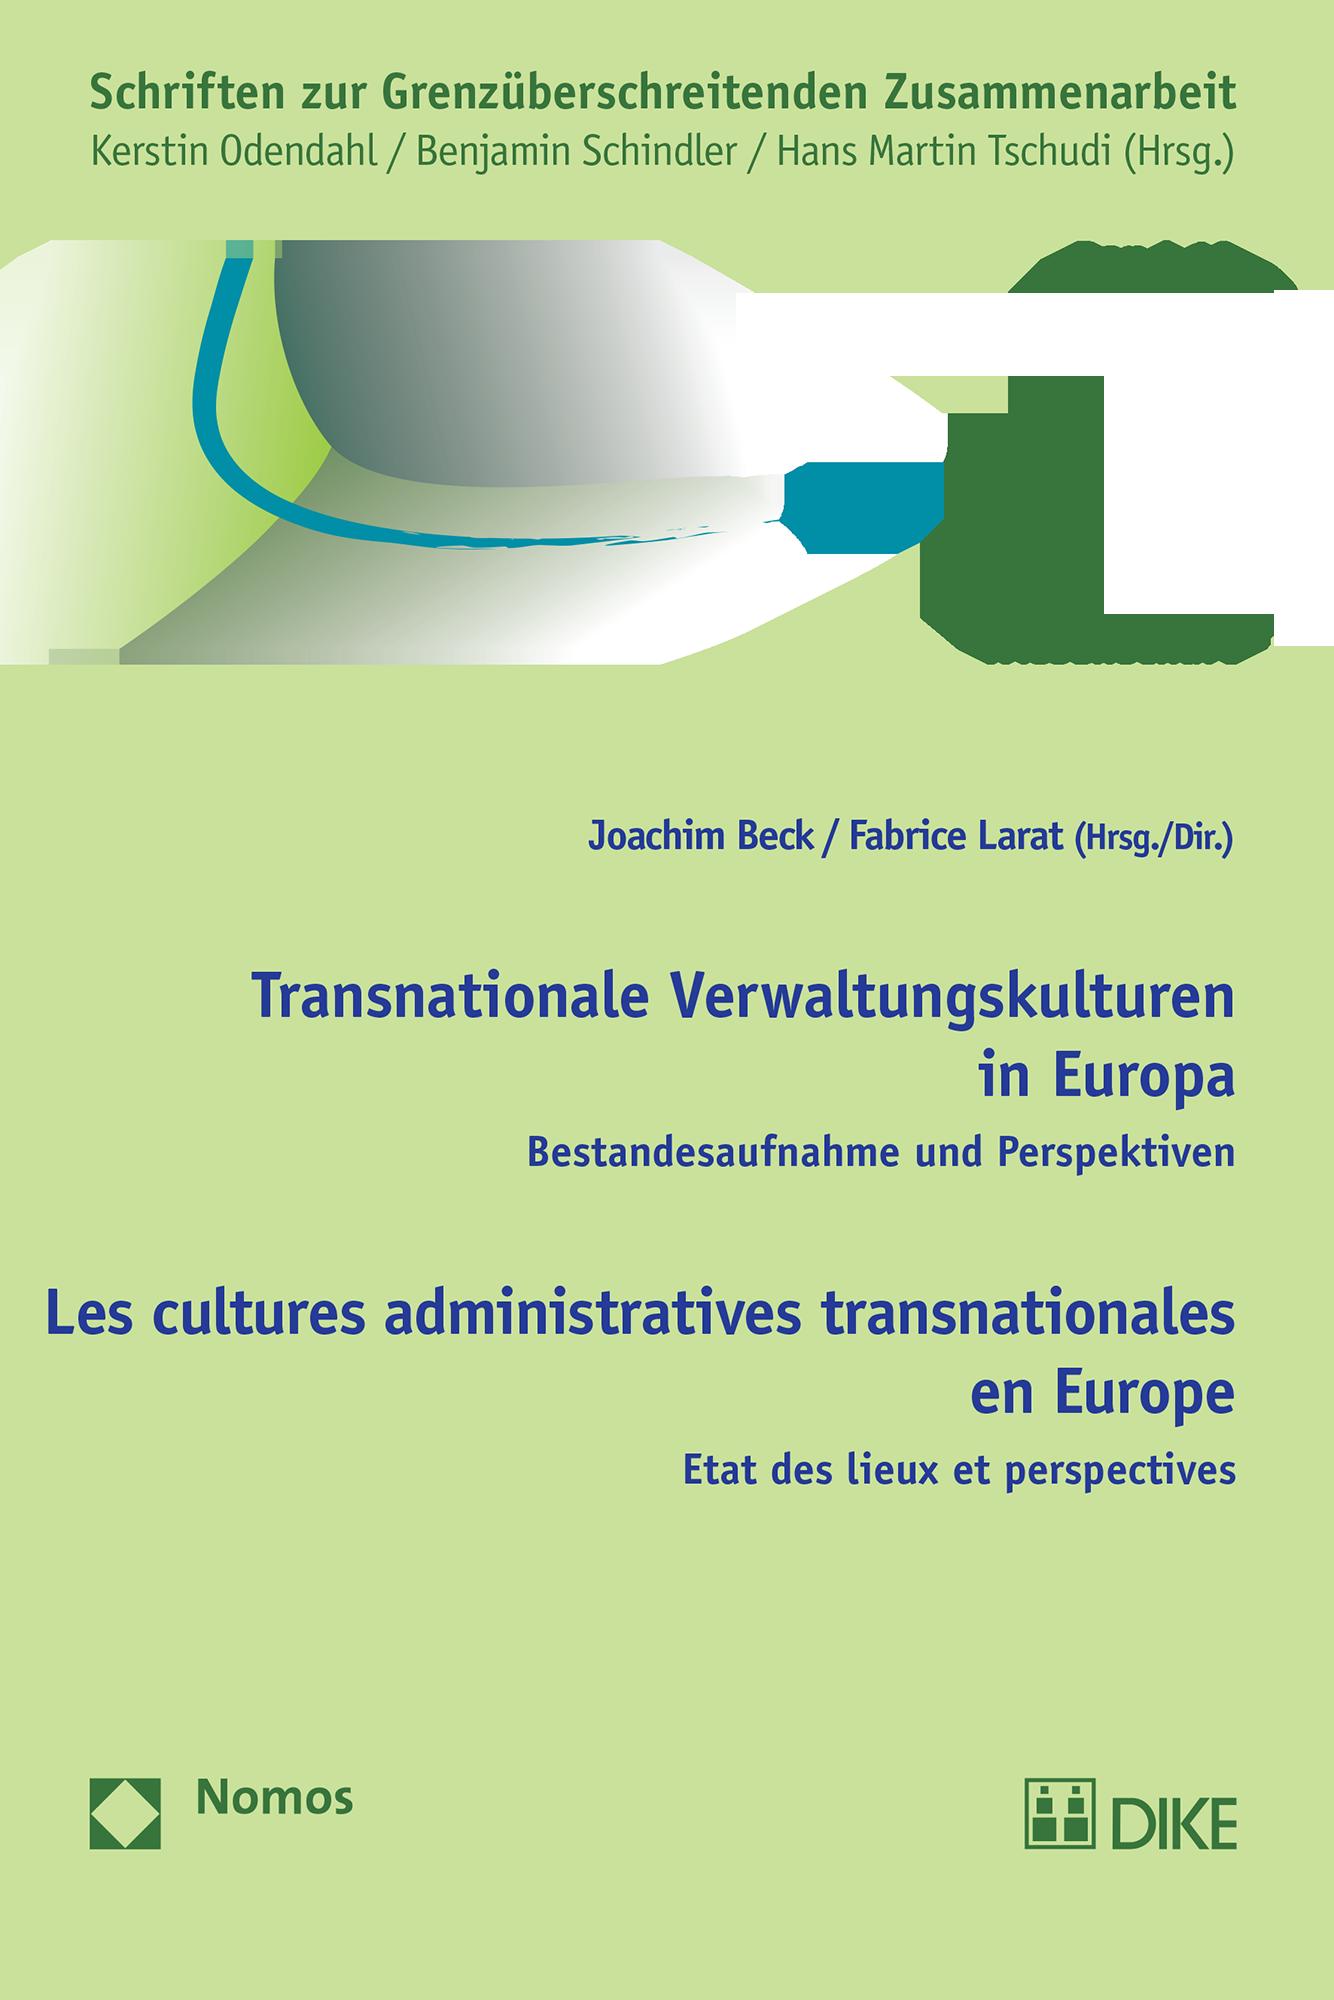 Transnationale Verwaltungskulturen in Europa/Les cultures administratives transnationales en Europe